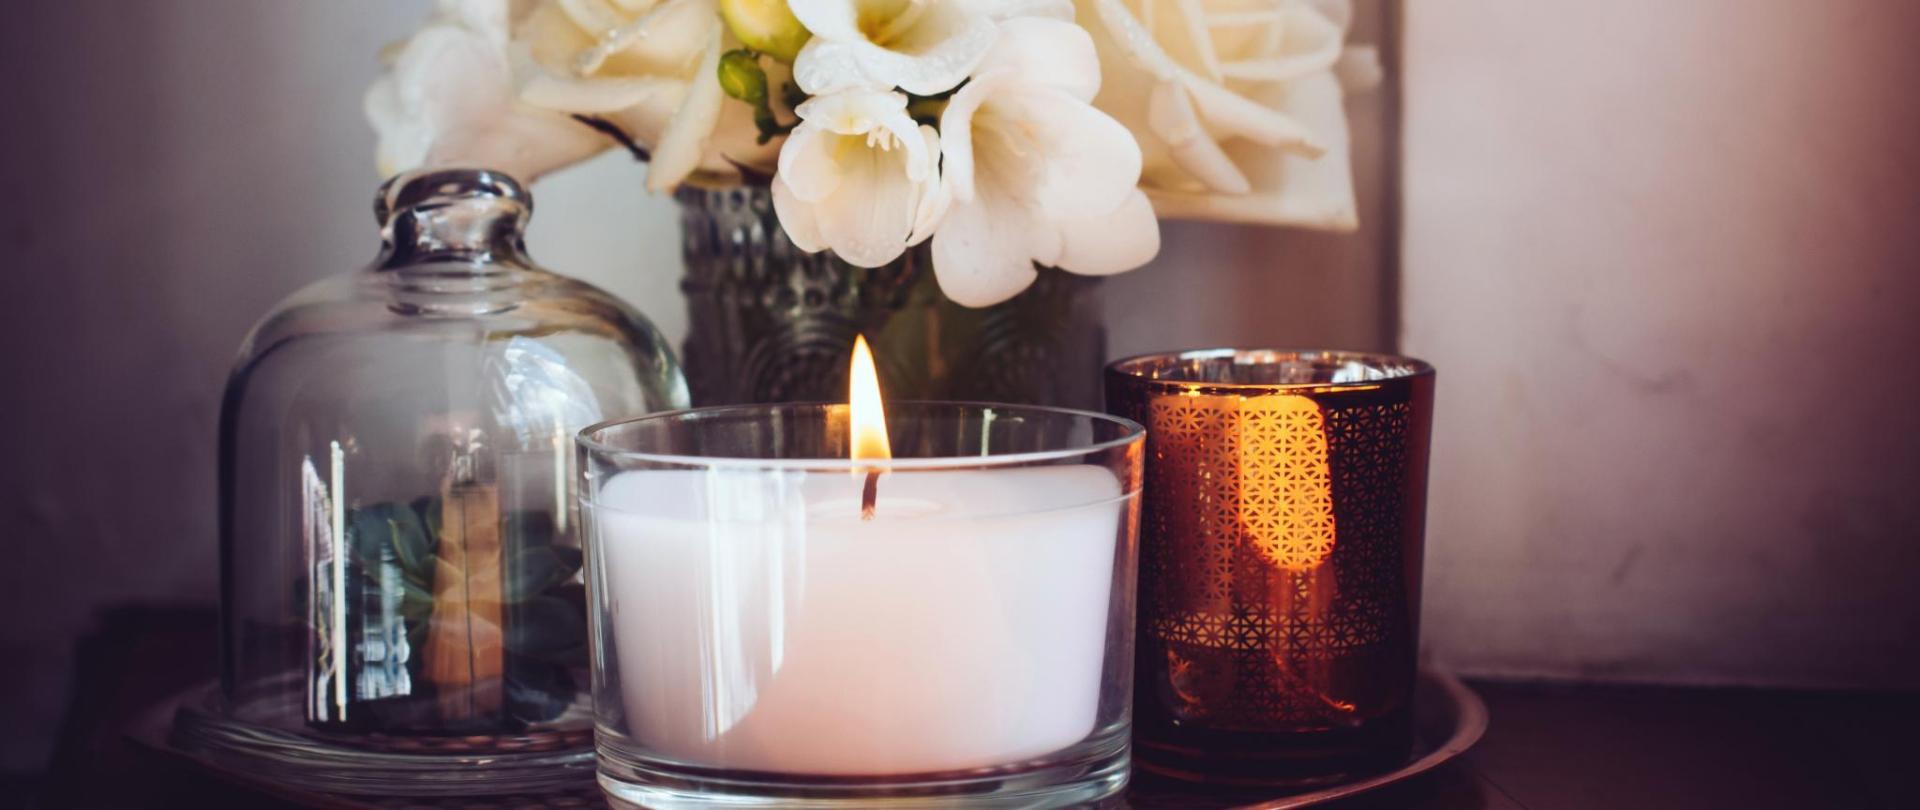 Dekoration Blumen, Kerze, Deckelglas.jpg